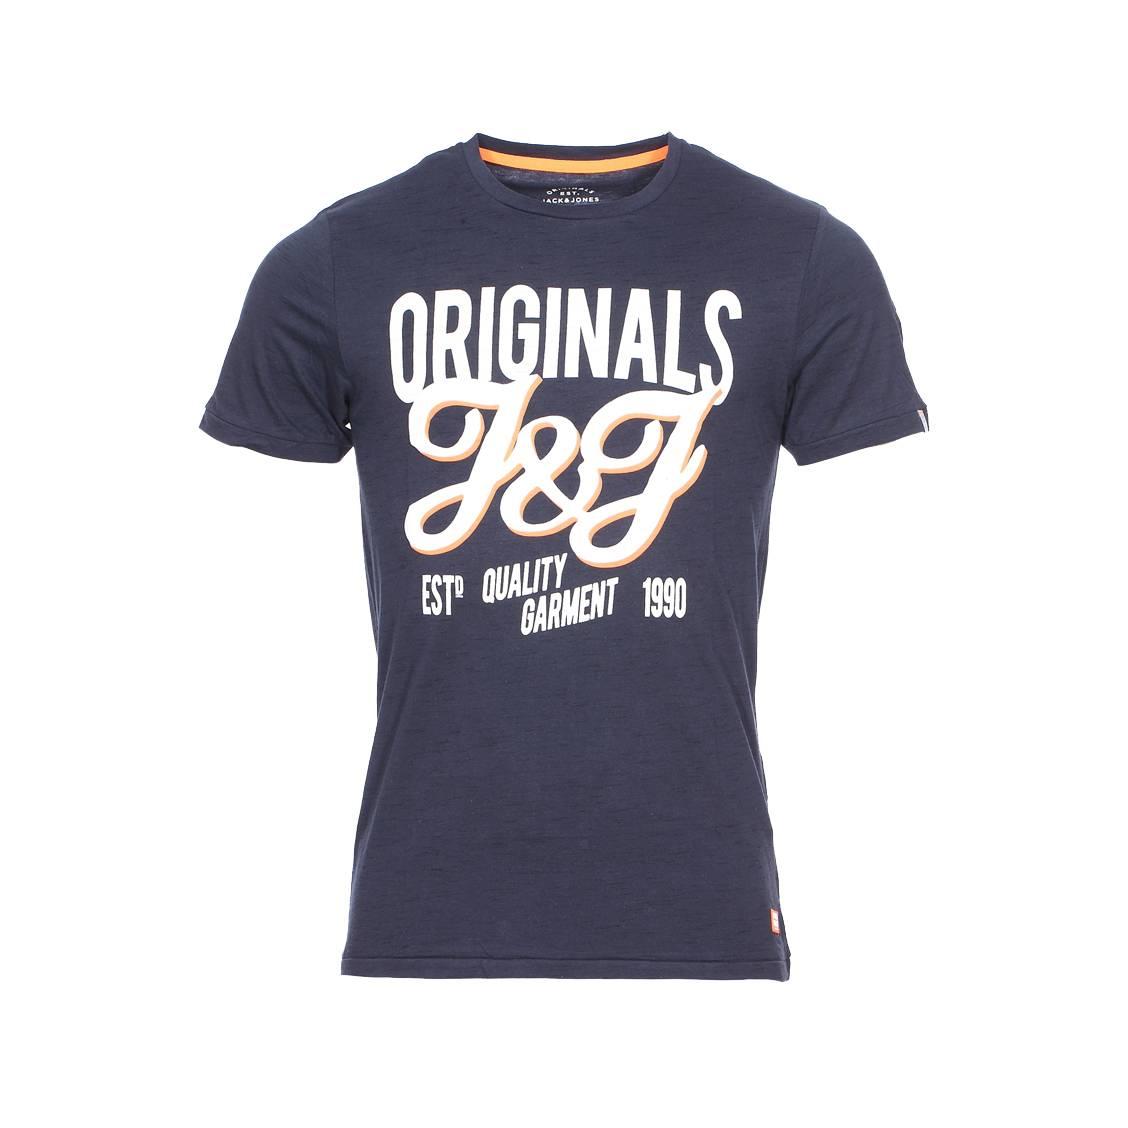 Tee-shirt col rond Jack Jones en coton mélangé bleu marine flammé floqué ... 8edda26103ff